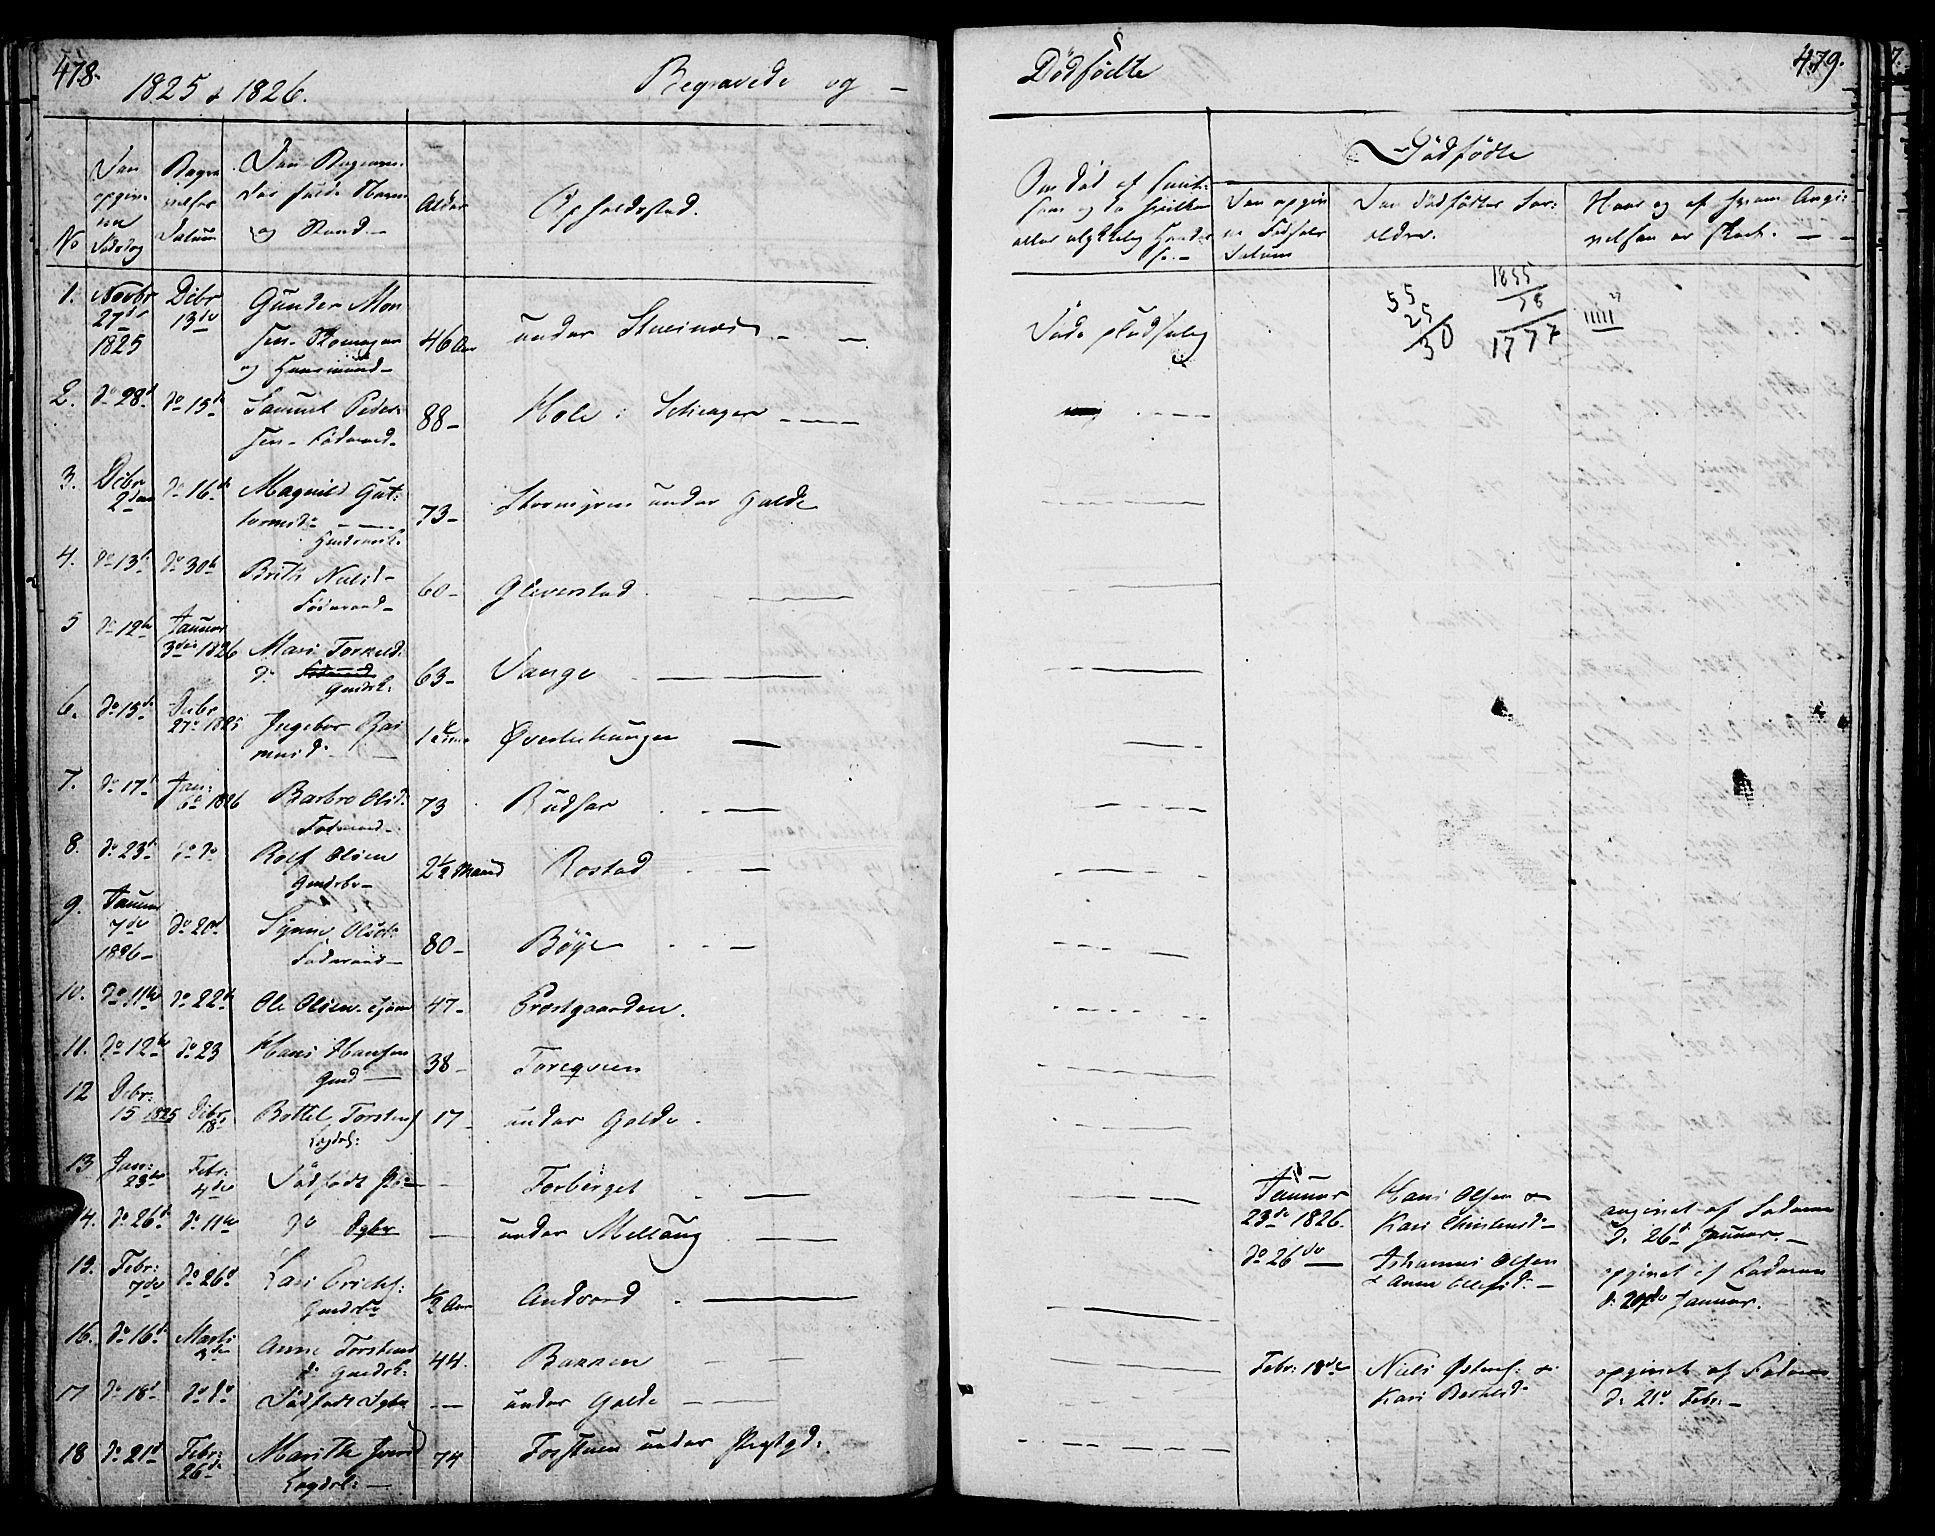 SAH, Lom prestekontor, K/L0005: Parish register (official) no. 5, 1825-1837, p. 478-479